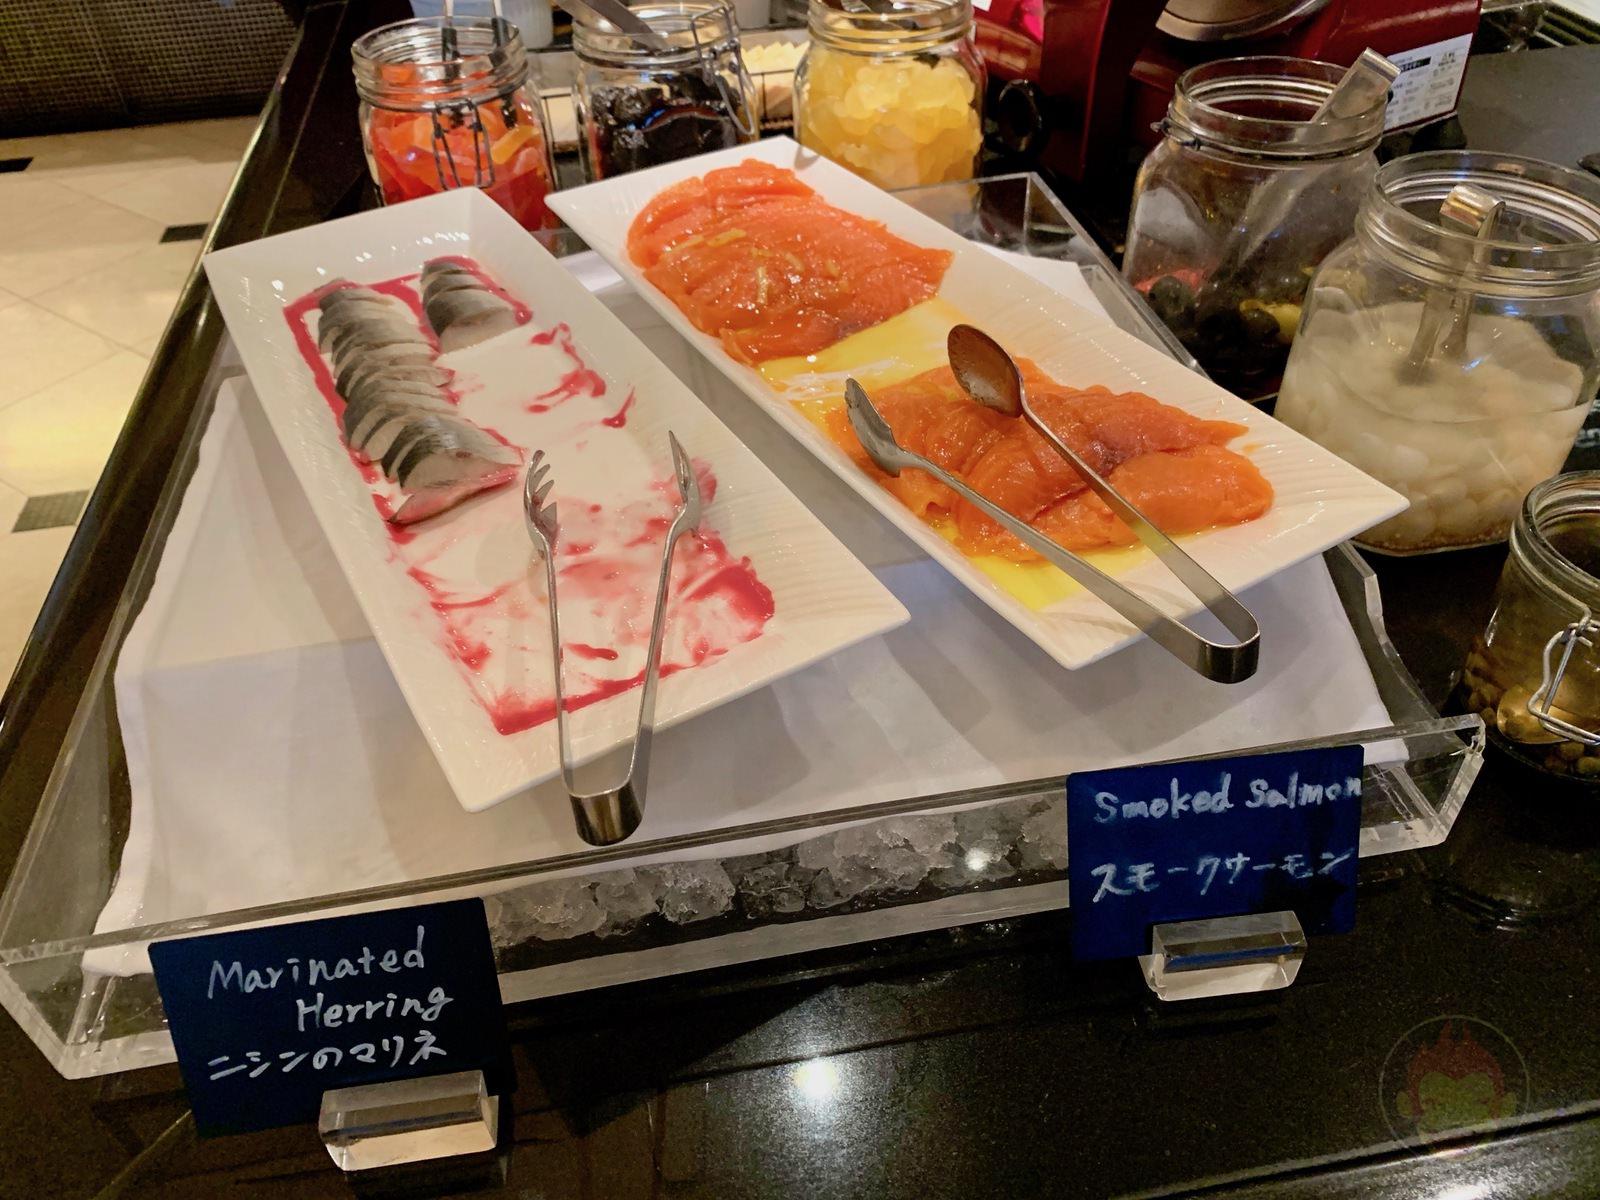 Westin tokyo theterrace lunch buffet 10